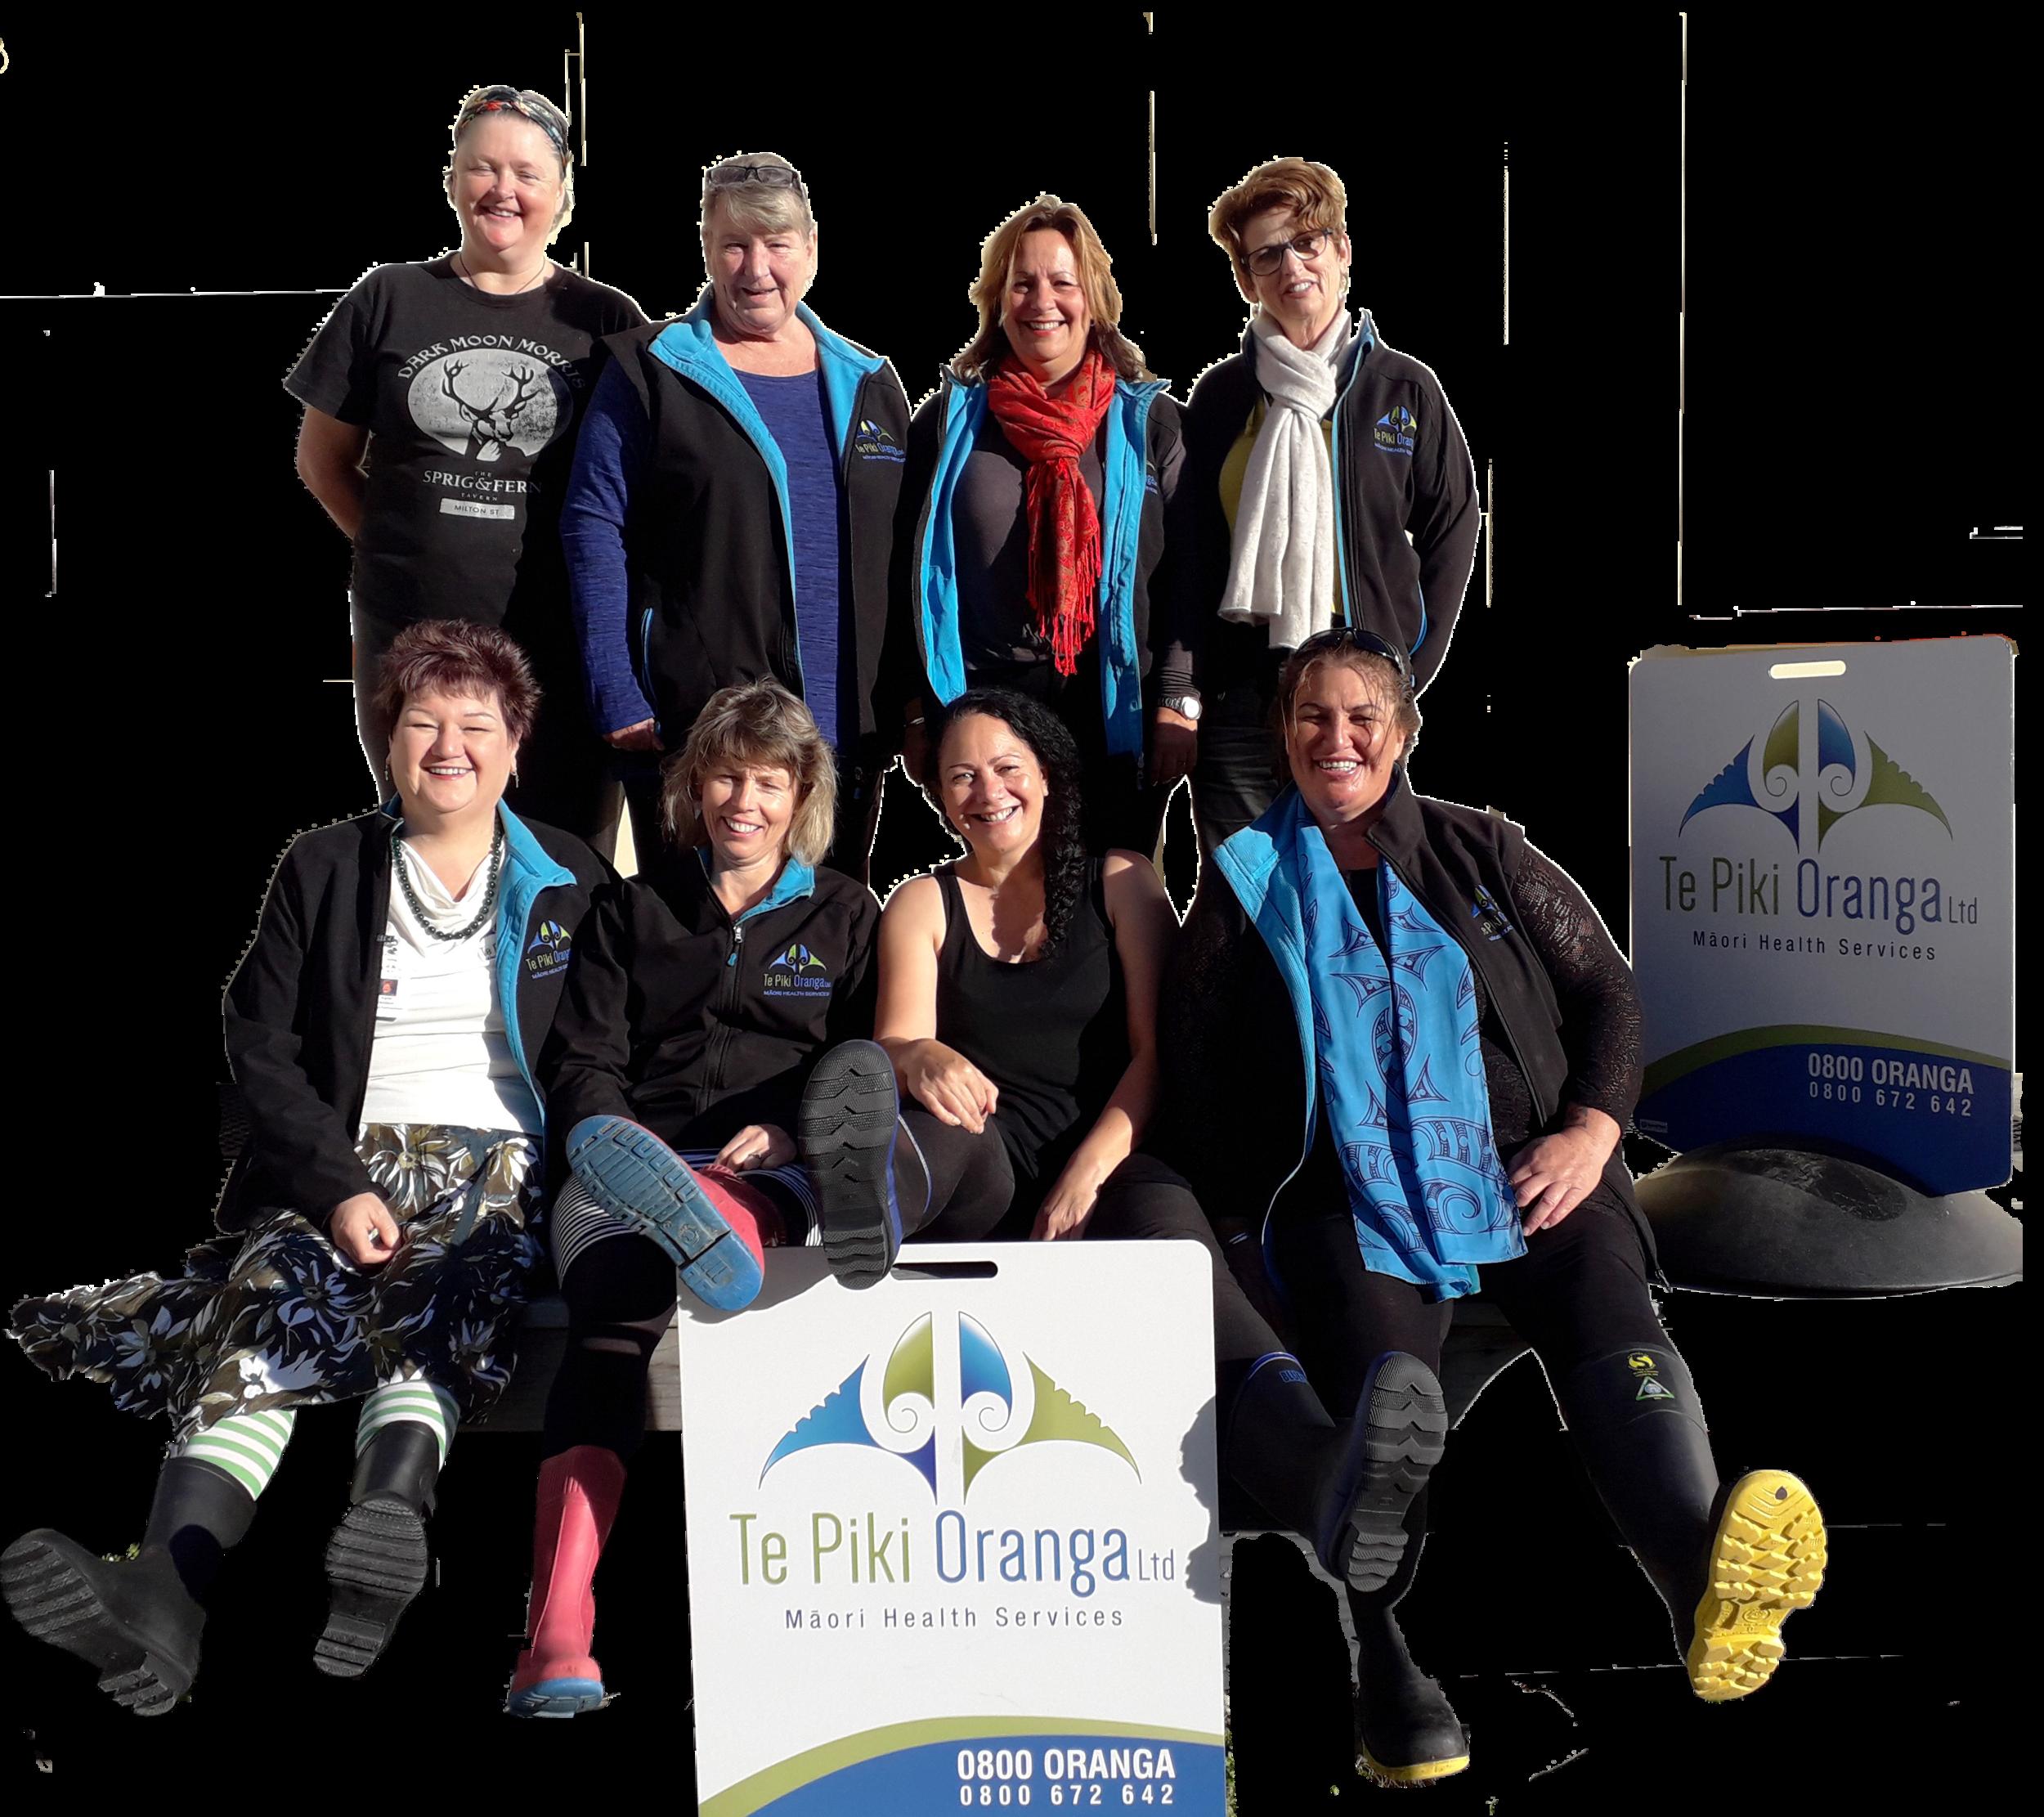 From top left clockwise: Jaine Cronin, Shelley Carter, Debbie Capatina, Carol Whitfield, Debbie Tauwhare, Marissa Scott, Dianne MacDonald and Karen Davidson